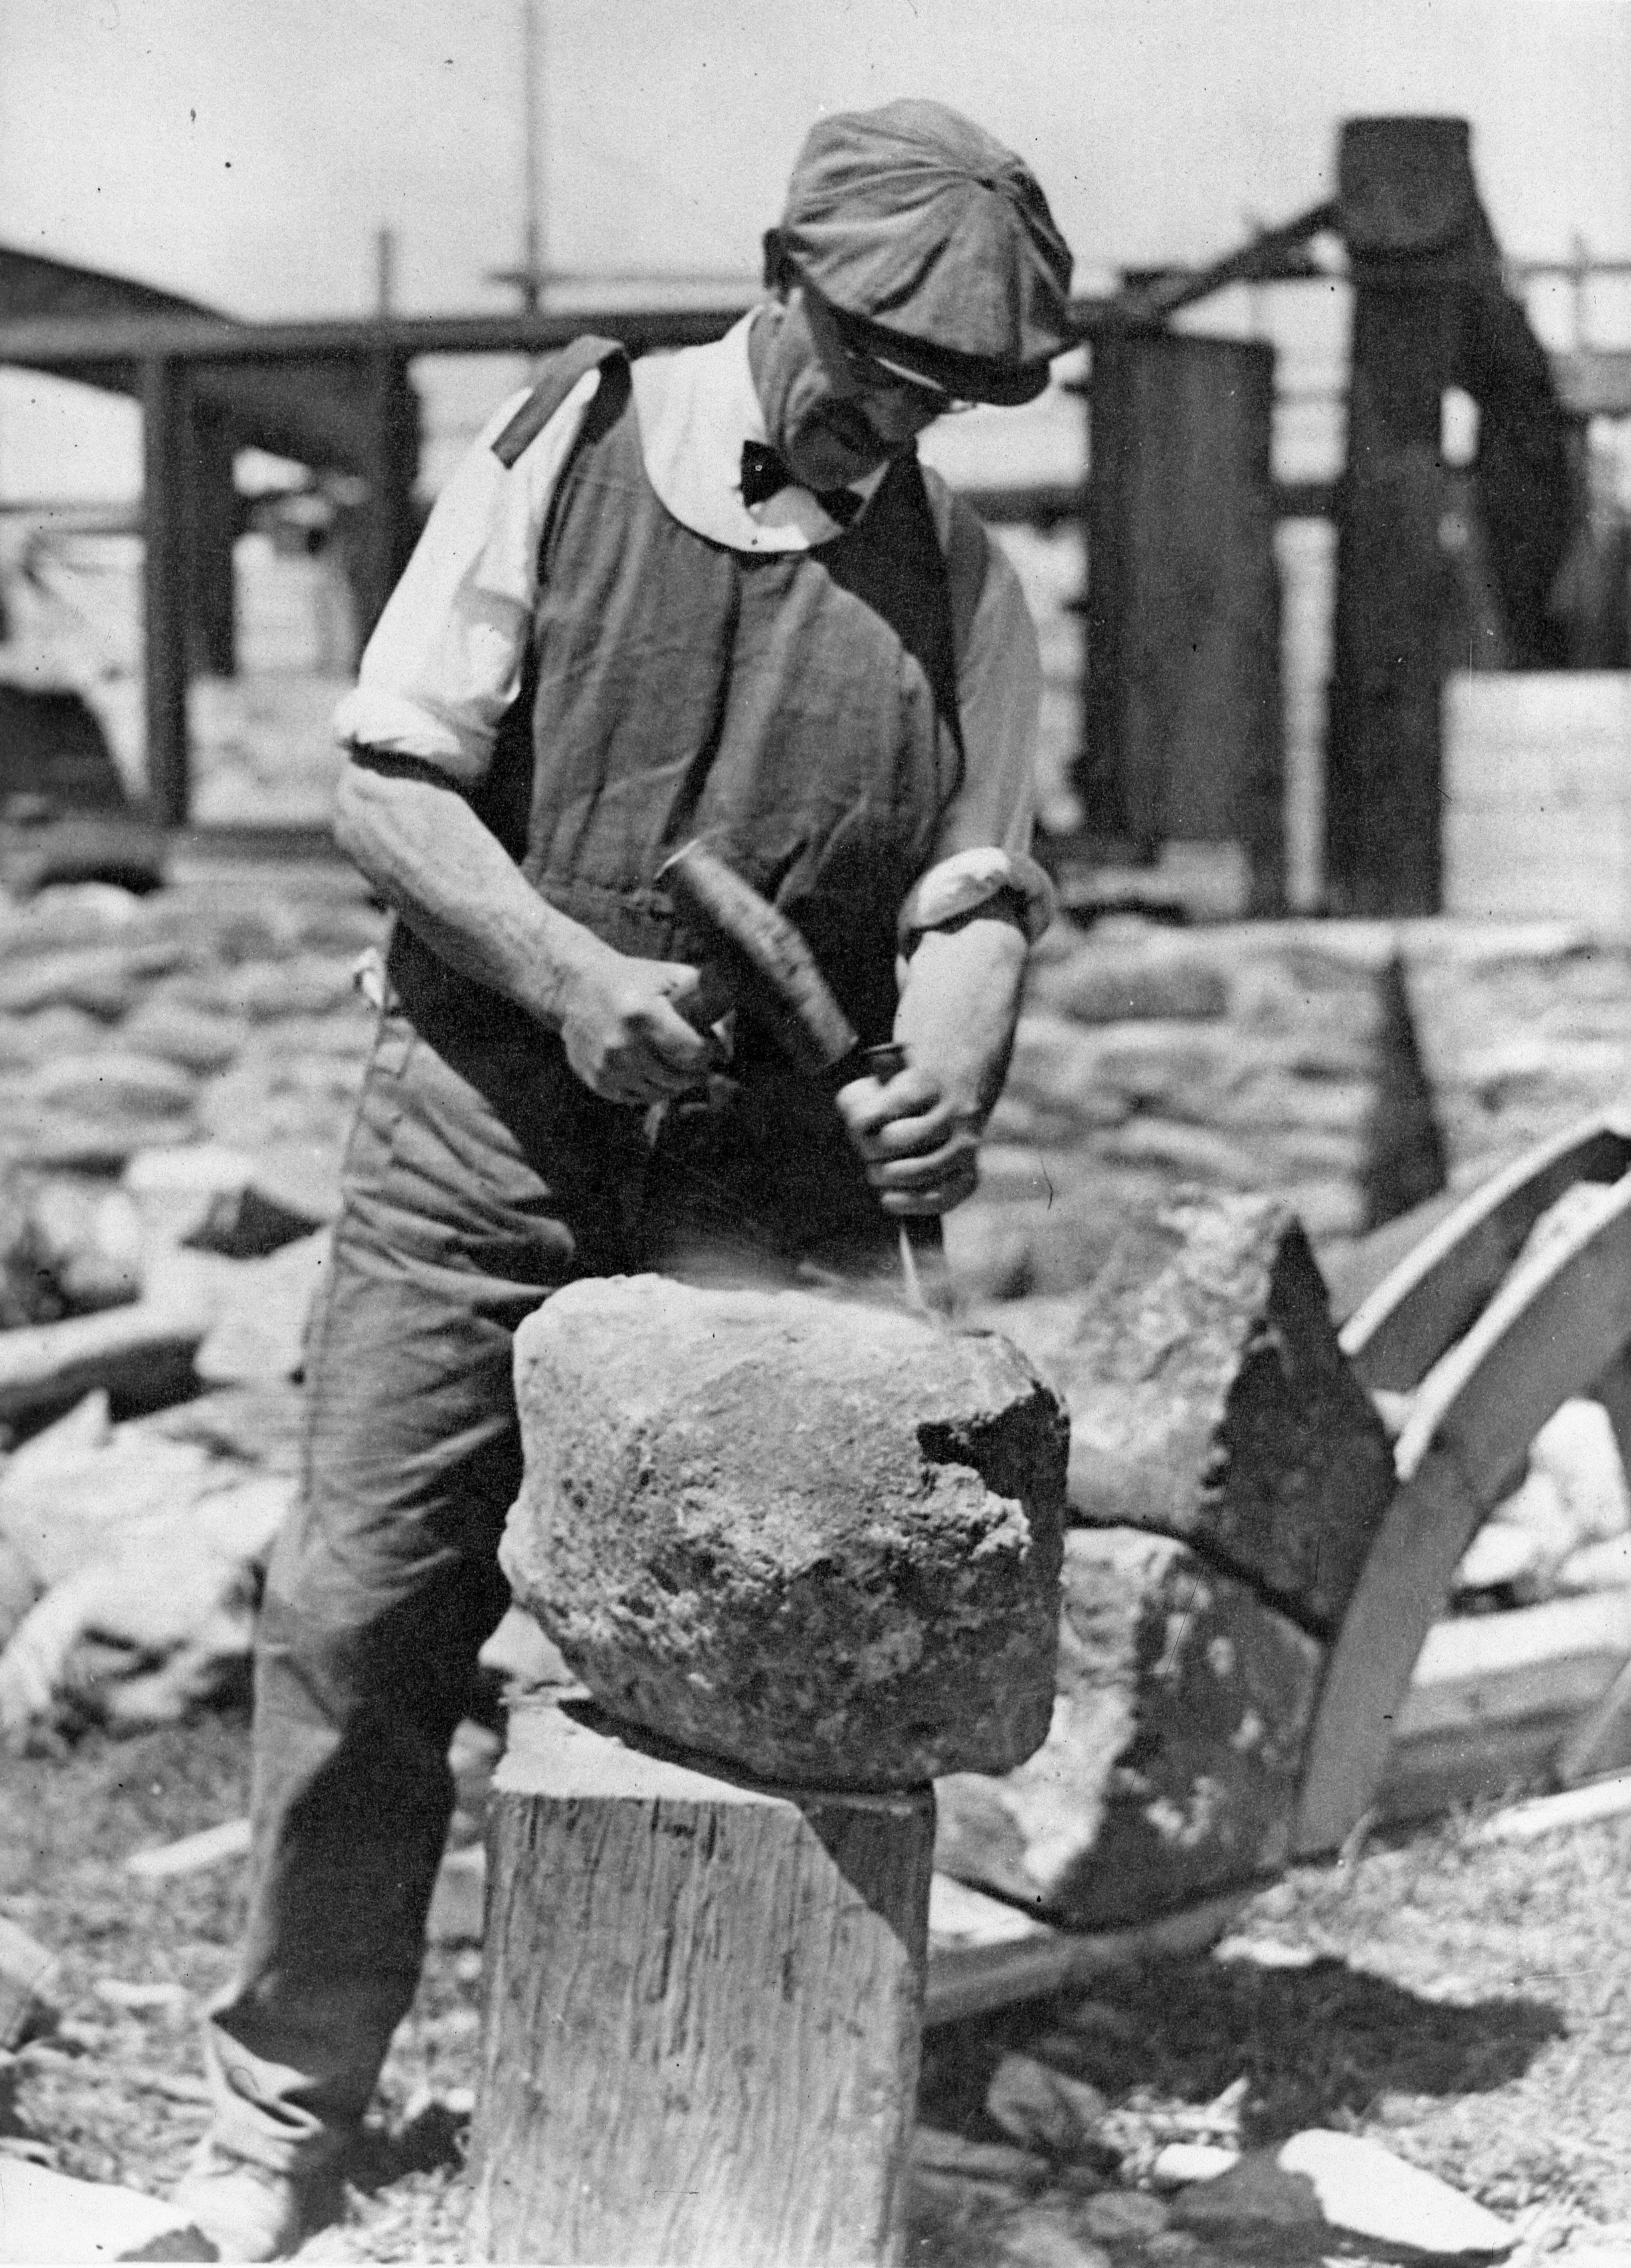 File:John Barr stonemason, 1930.jpg - Wikimedia Commons